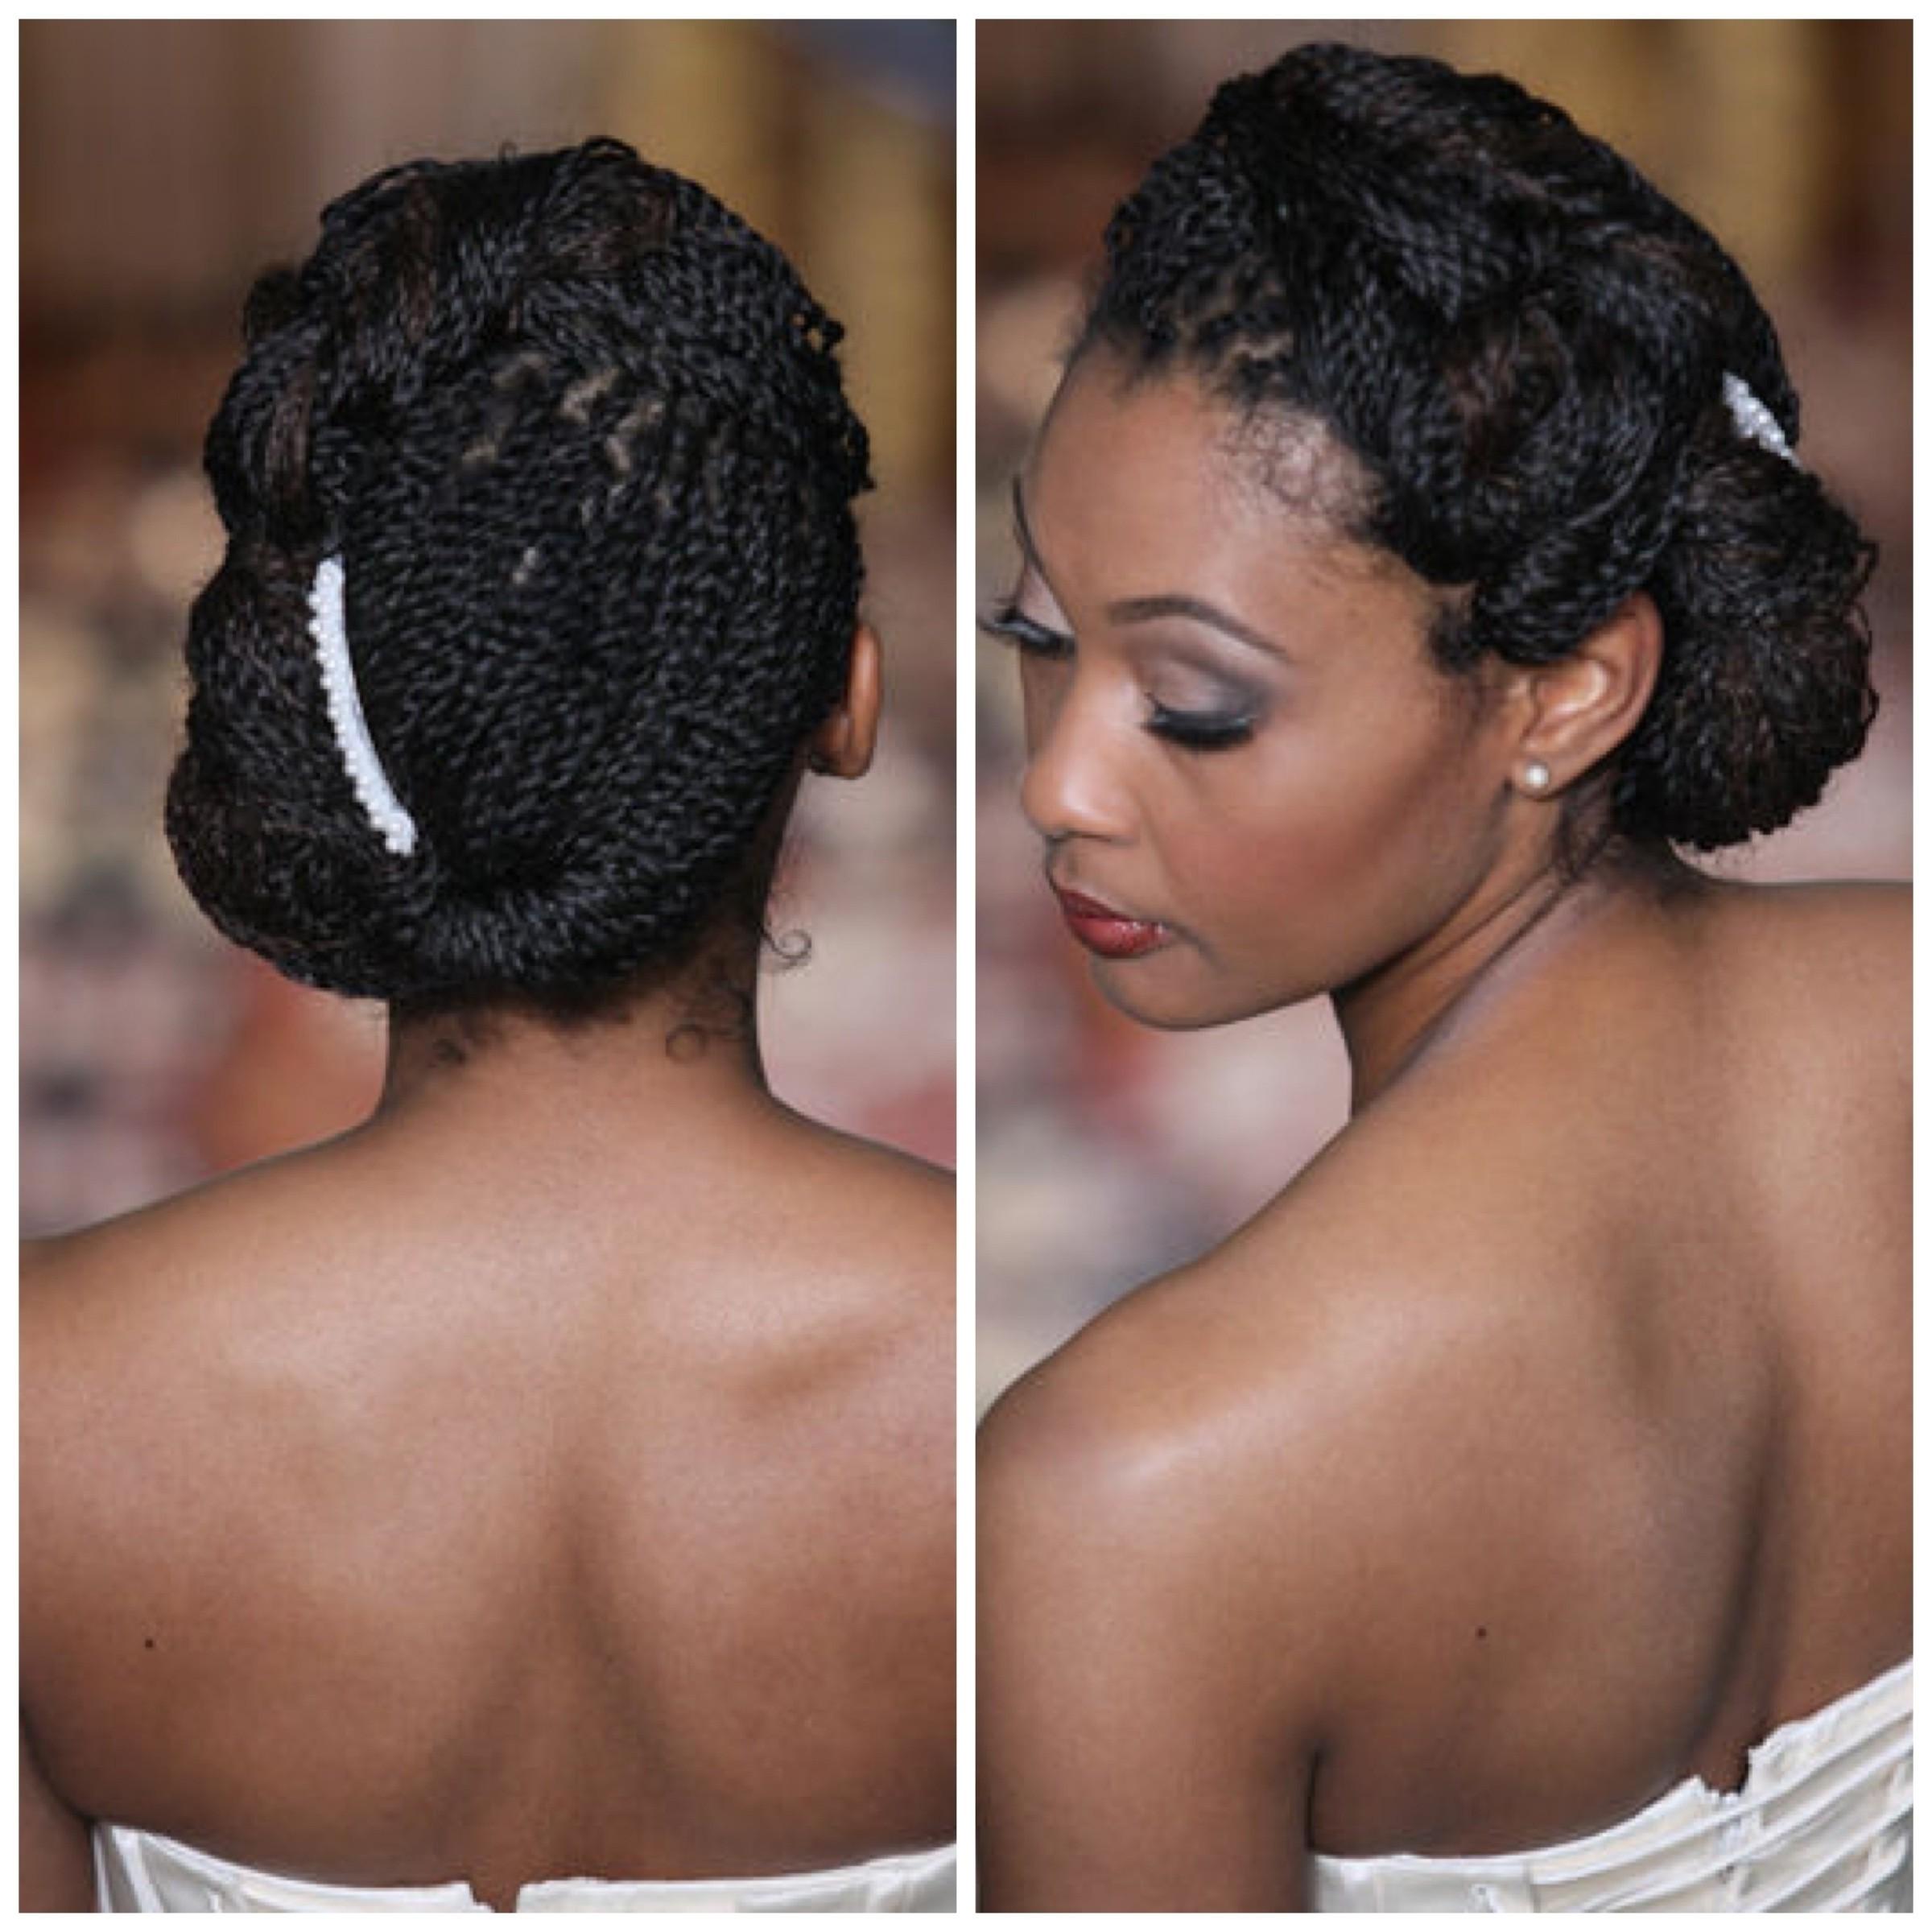 Pleasing Black Braids Updo Hairstyles Also Updo Black Braided